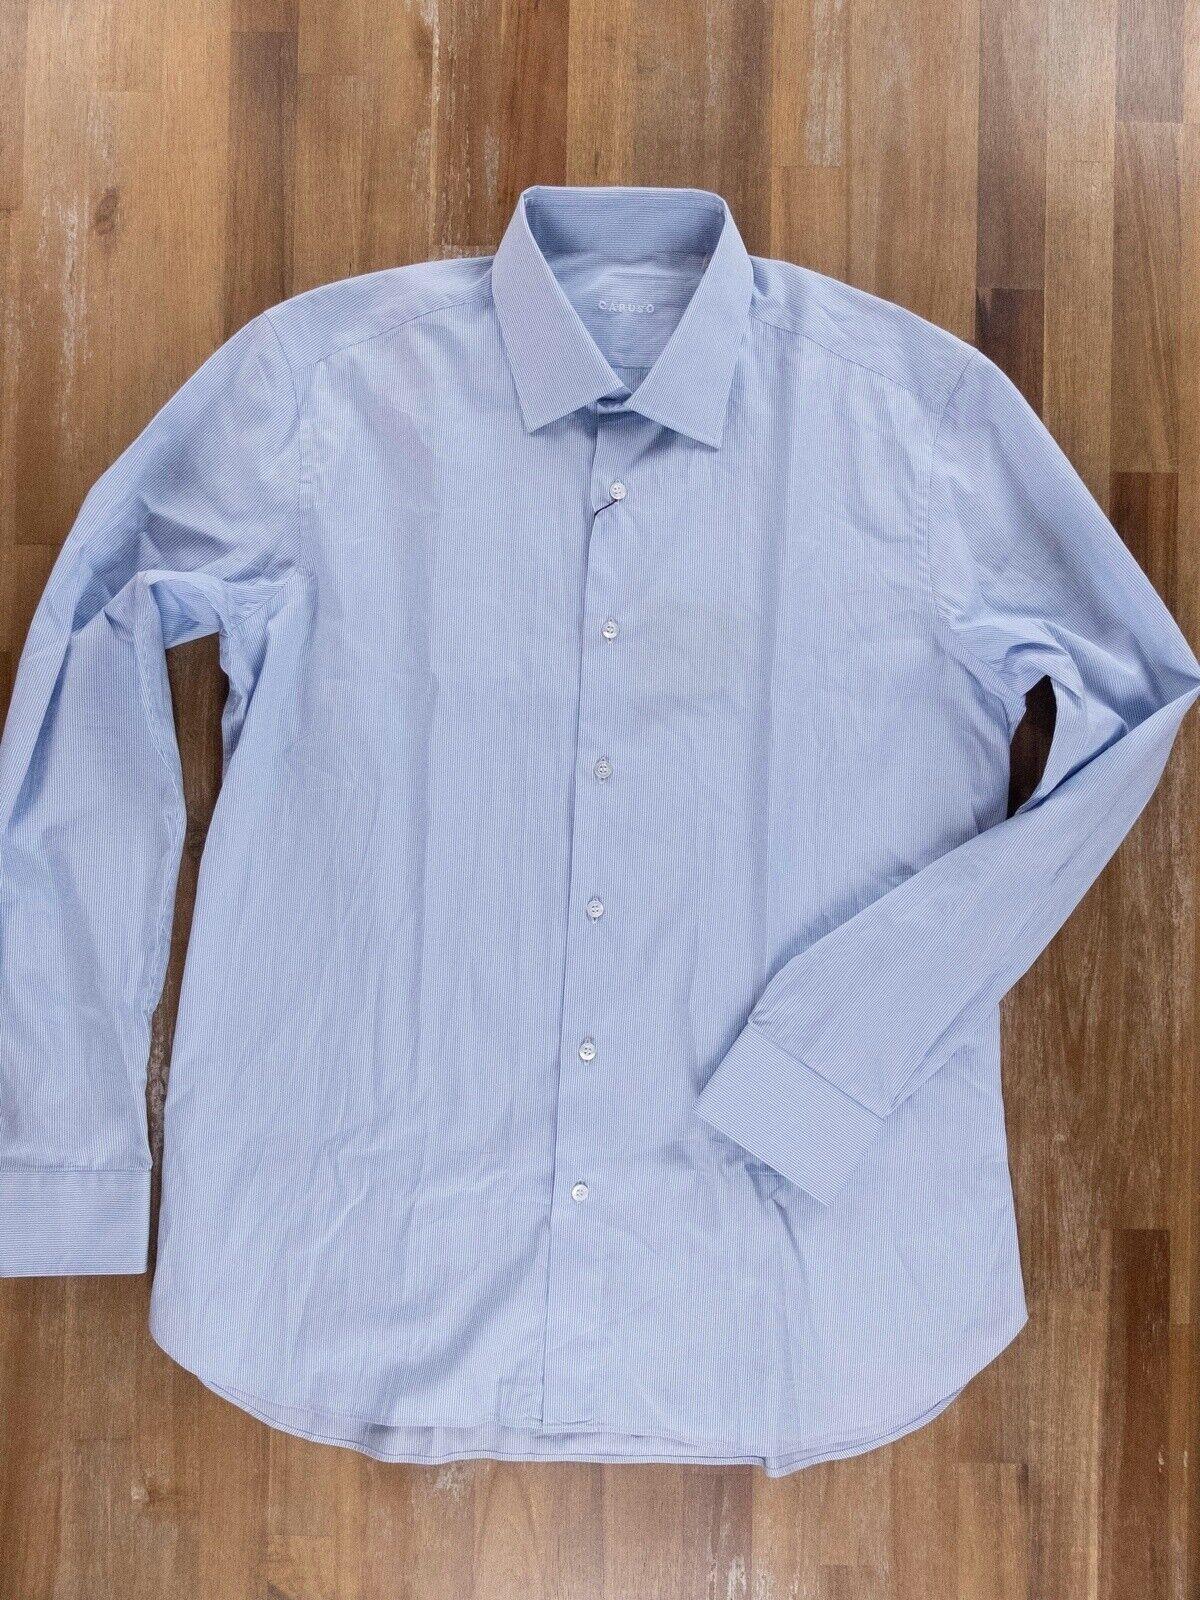 CARUSO Blau striped baumwolle hemd authentic - Größe 42   16.5 - NWOT